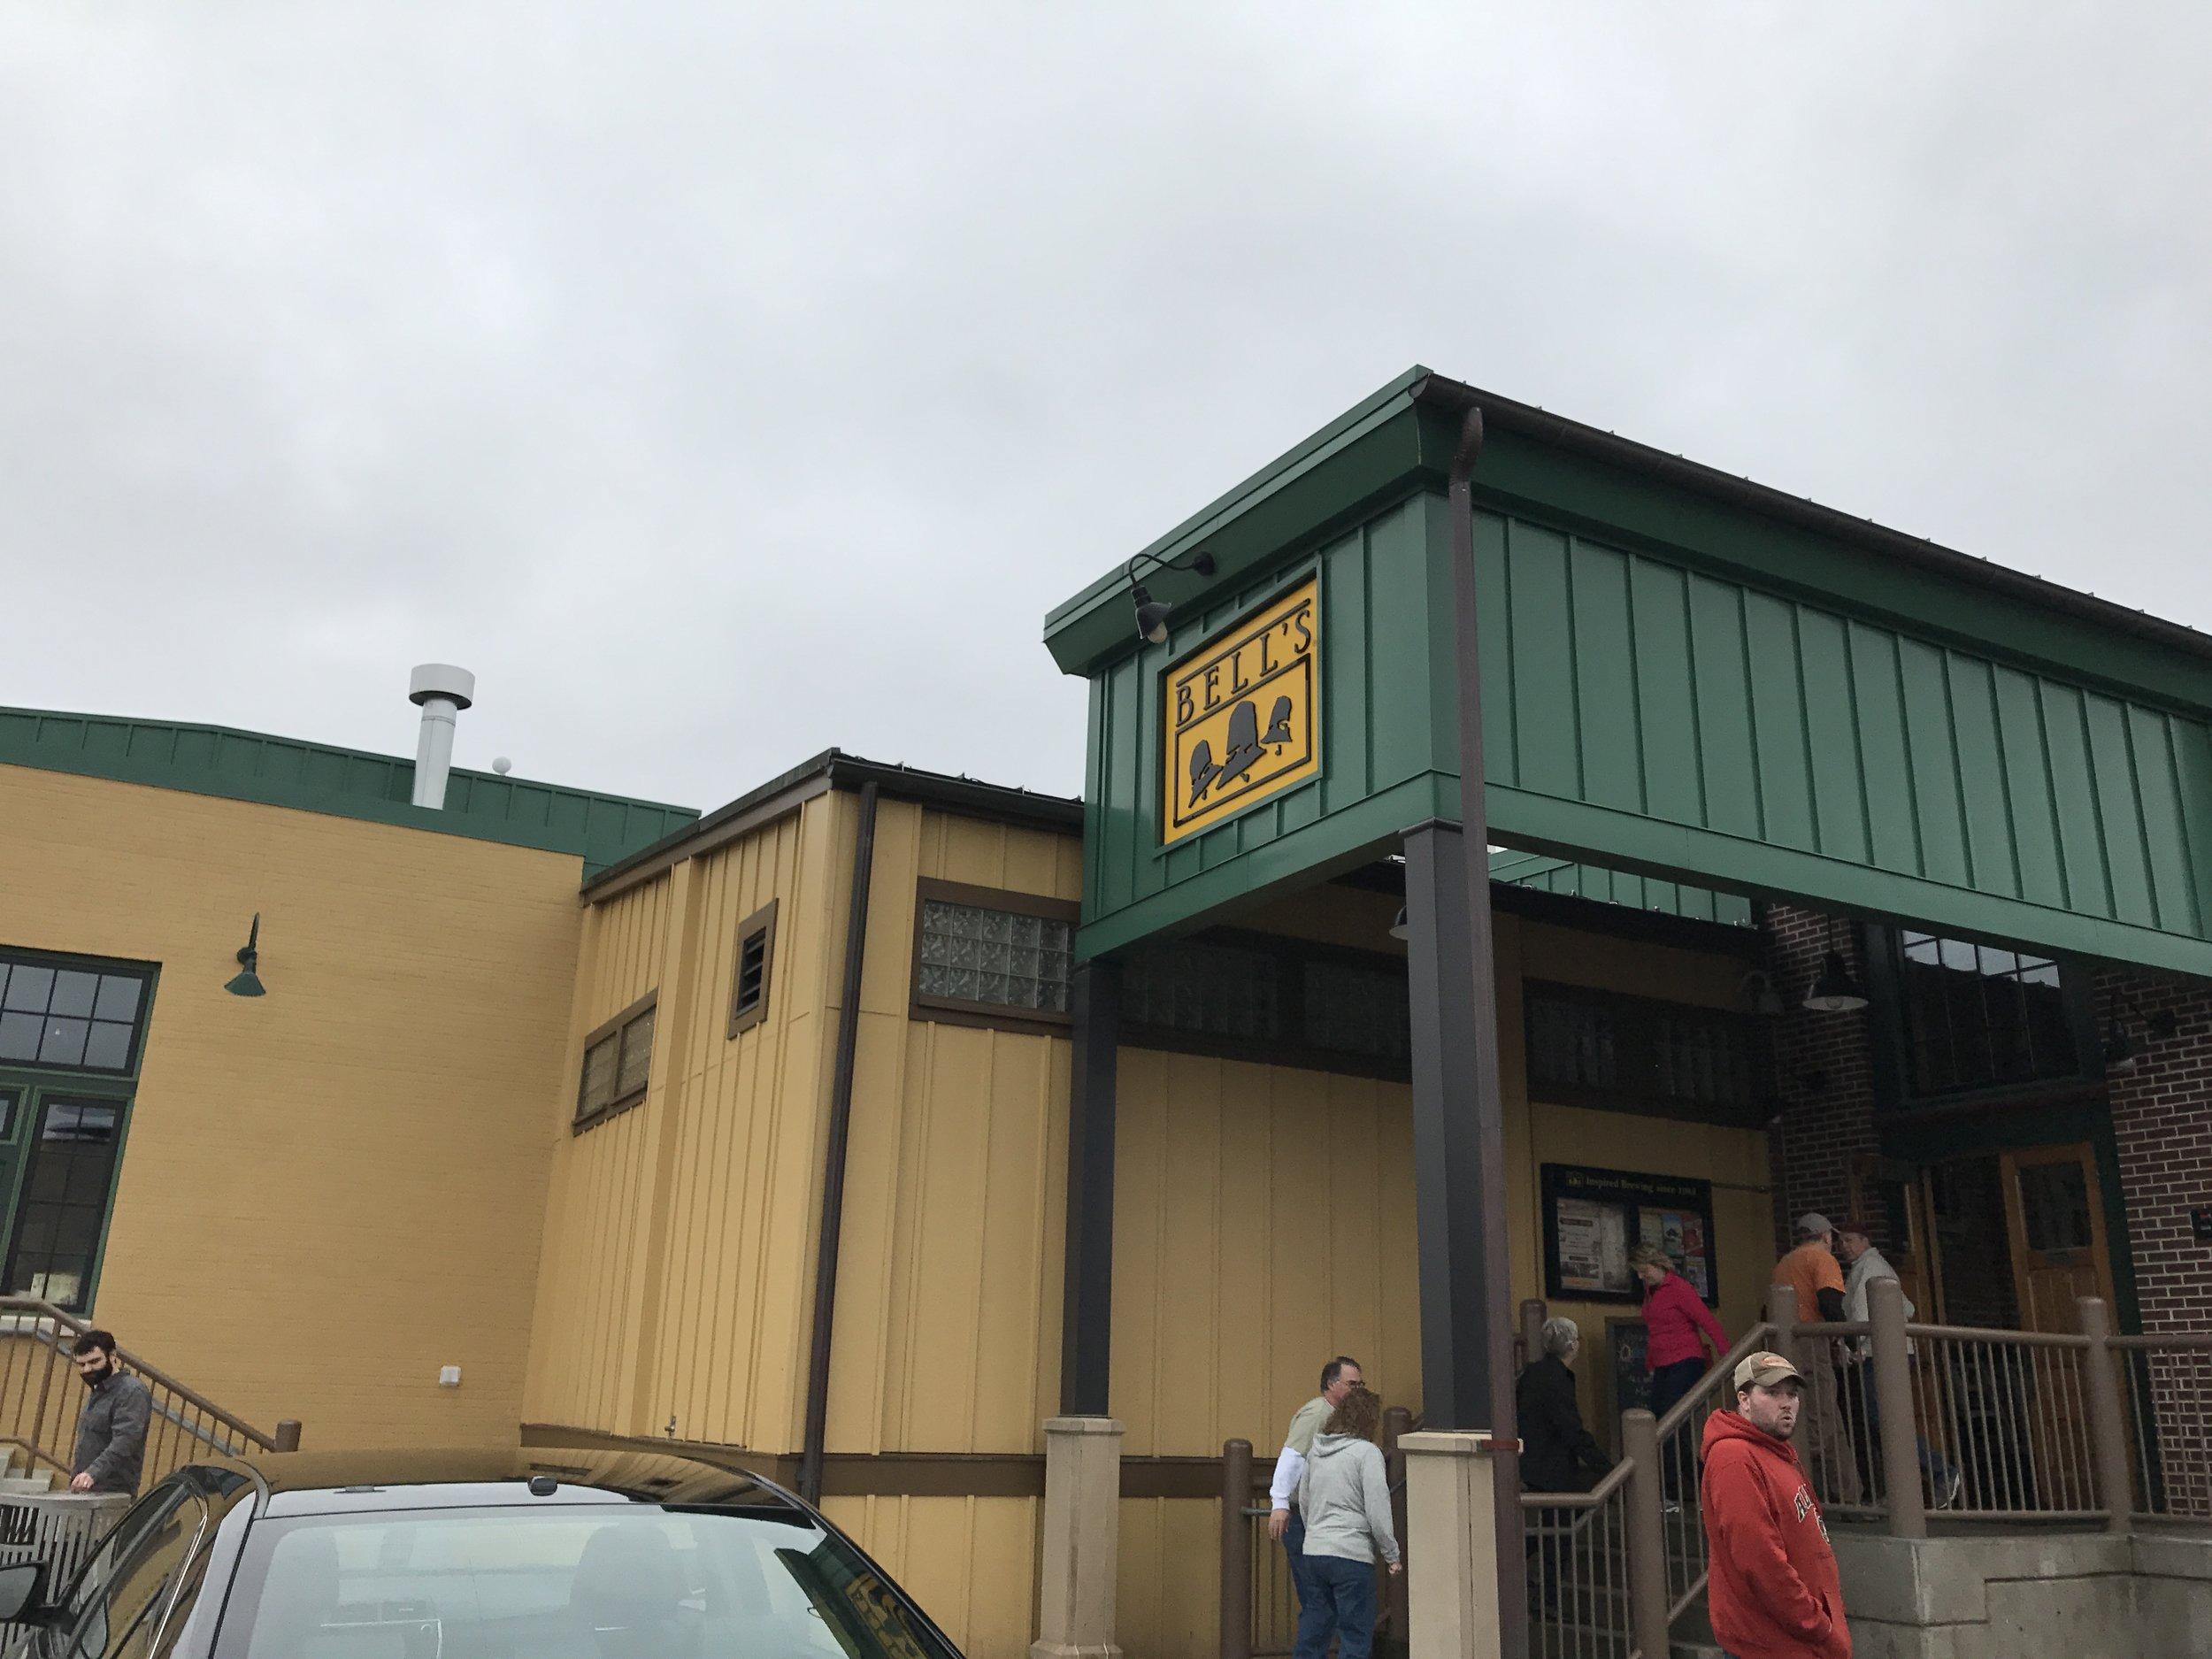 Outside of Bell's